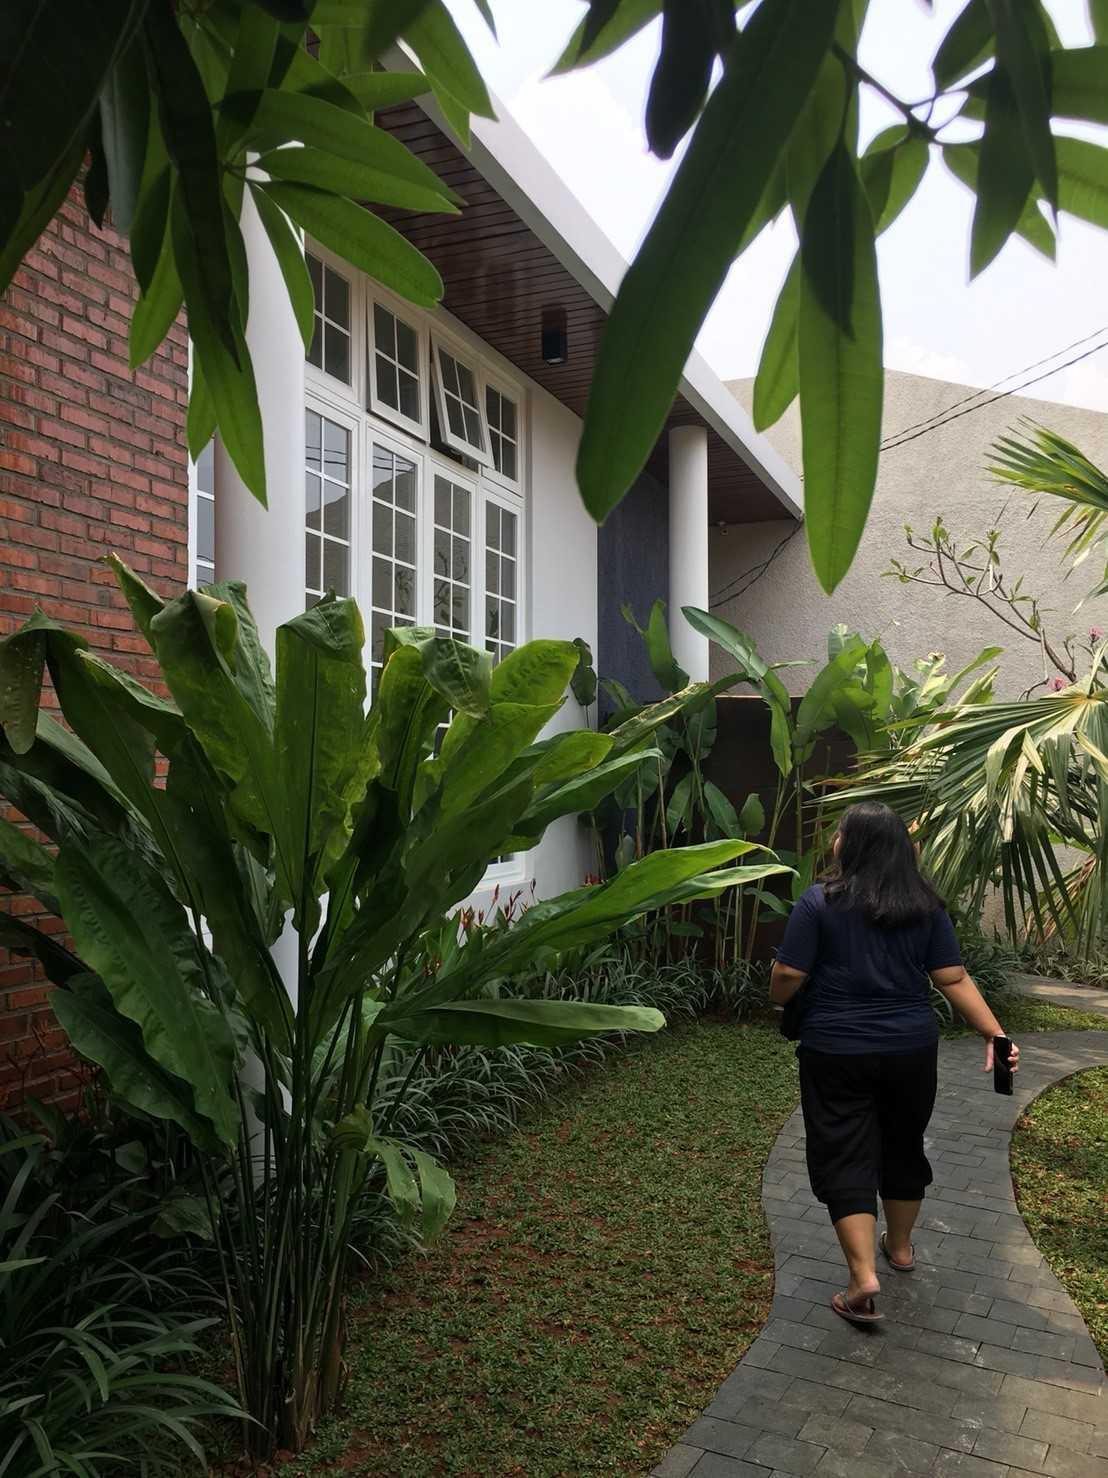 Ho.la Studio Arsitektur K House Bekasi Bar., Kota Bks, Jawa Barat, Indonesia Bekasi Bar., Kota Bks, Jawa Barat, Indonesia Hola-Studio-Arsitektur-K-House   68921